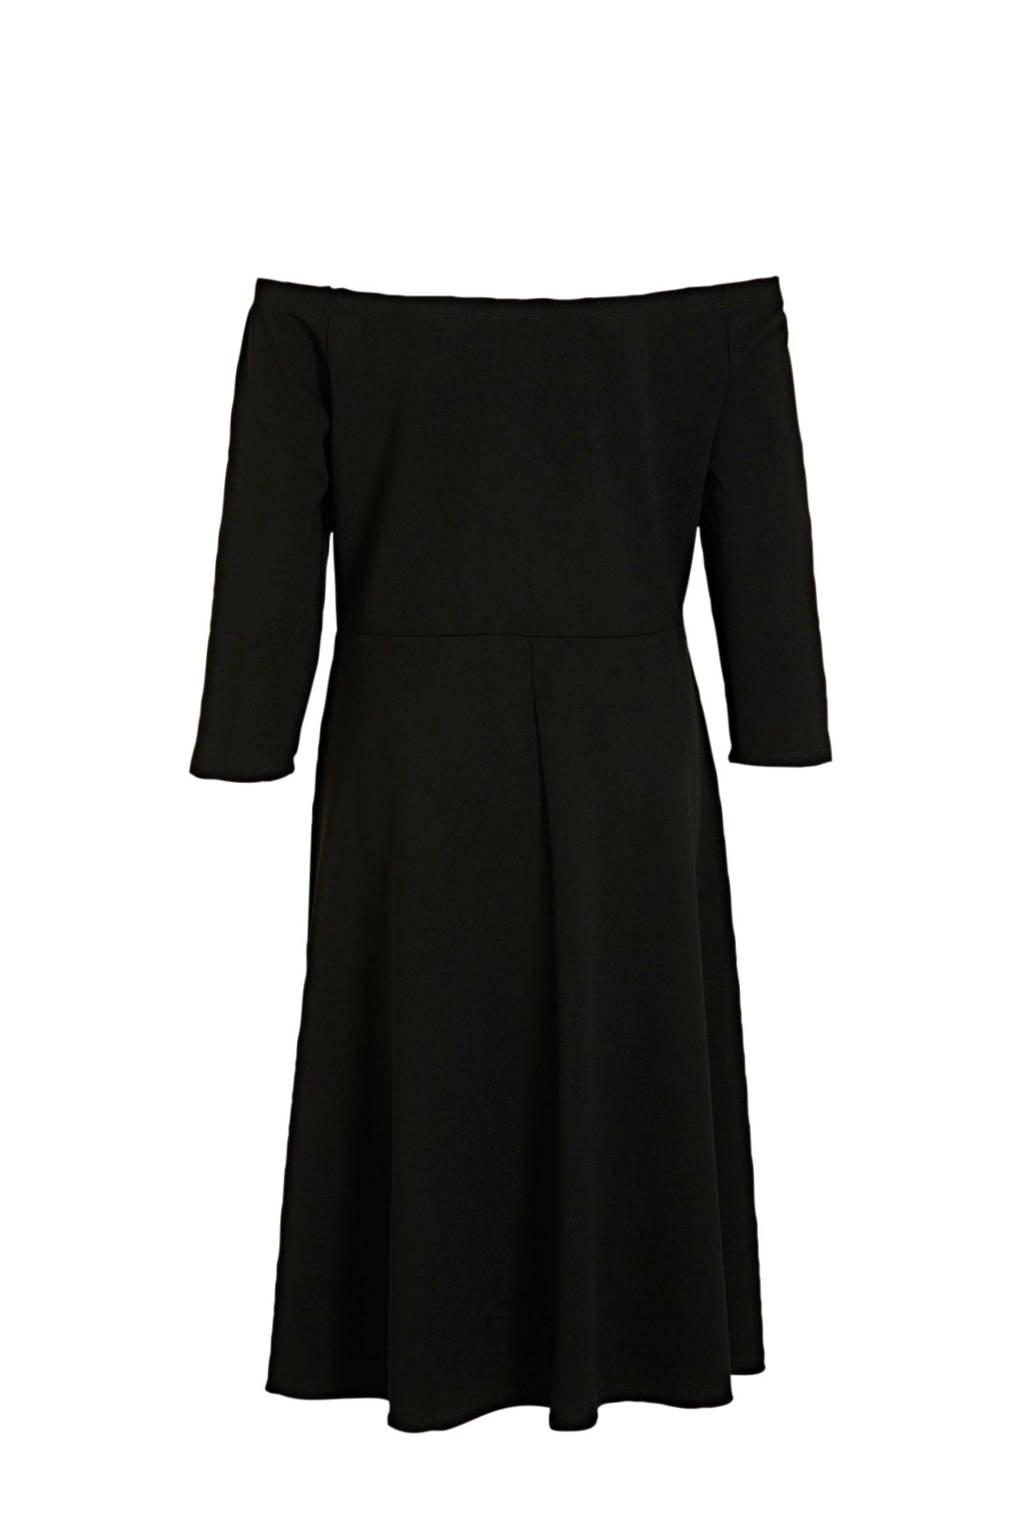 JD Williams off shoulder jurk zwart, Zwart